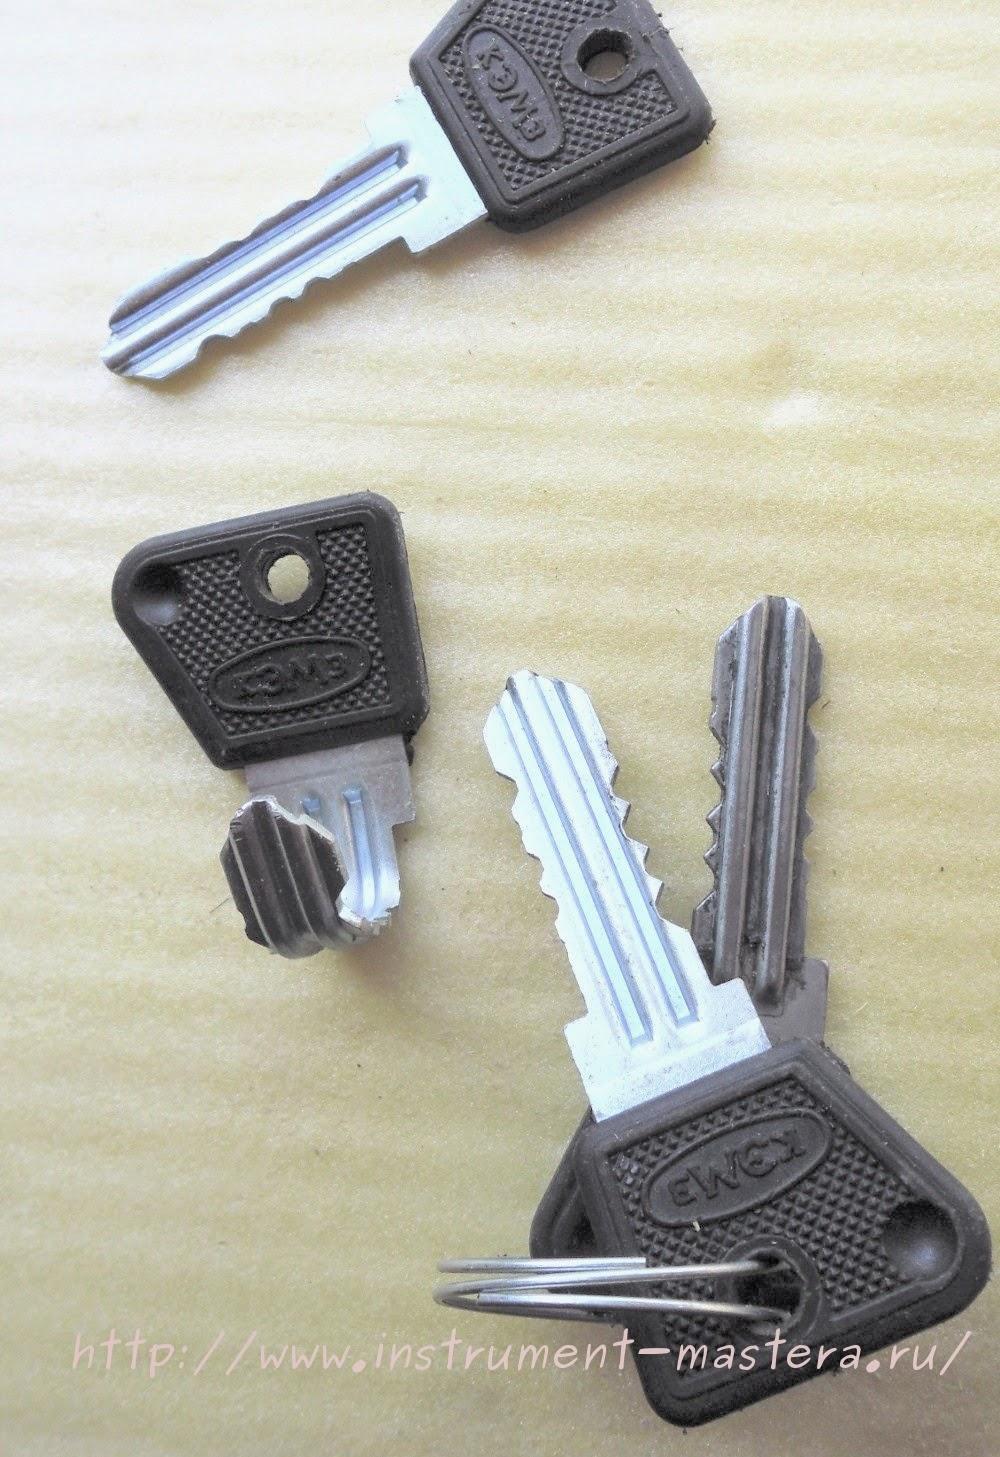 Крючки для вешалки из ключей